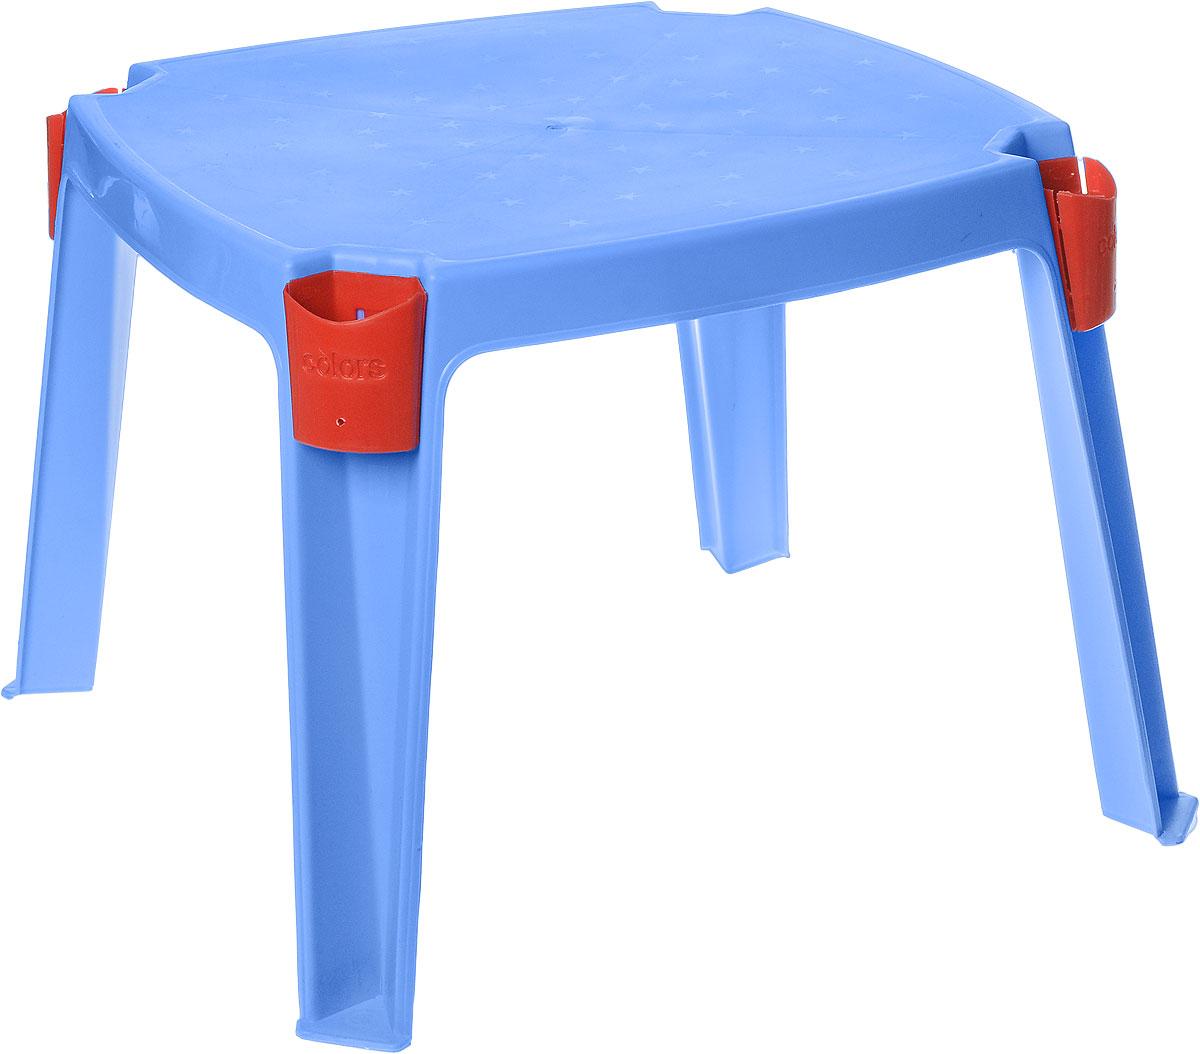 PalPlay Стол детский с карманами цвет голубой 53 см х 53 см 364_голубой